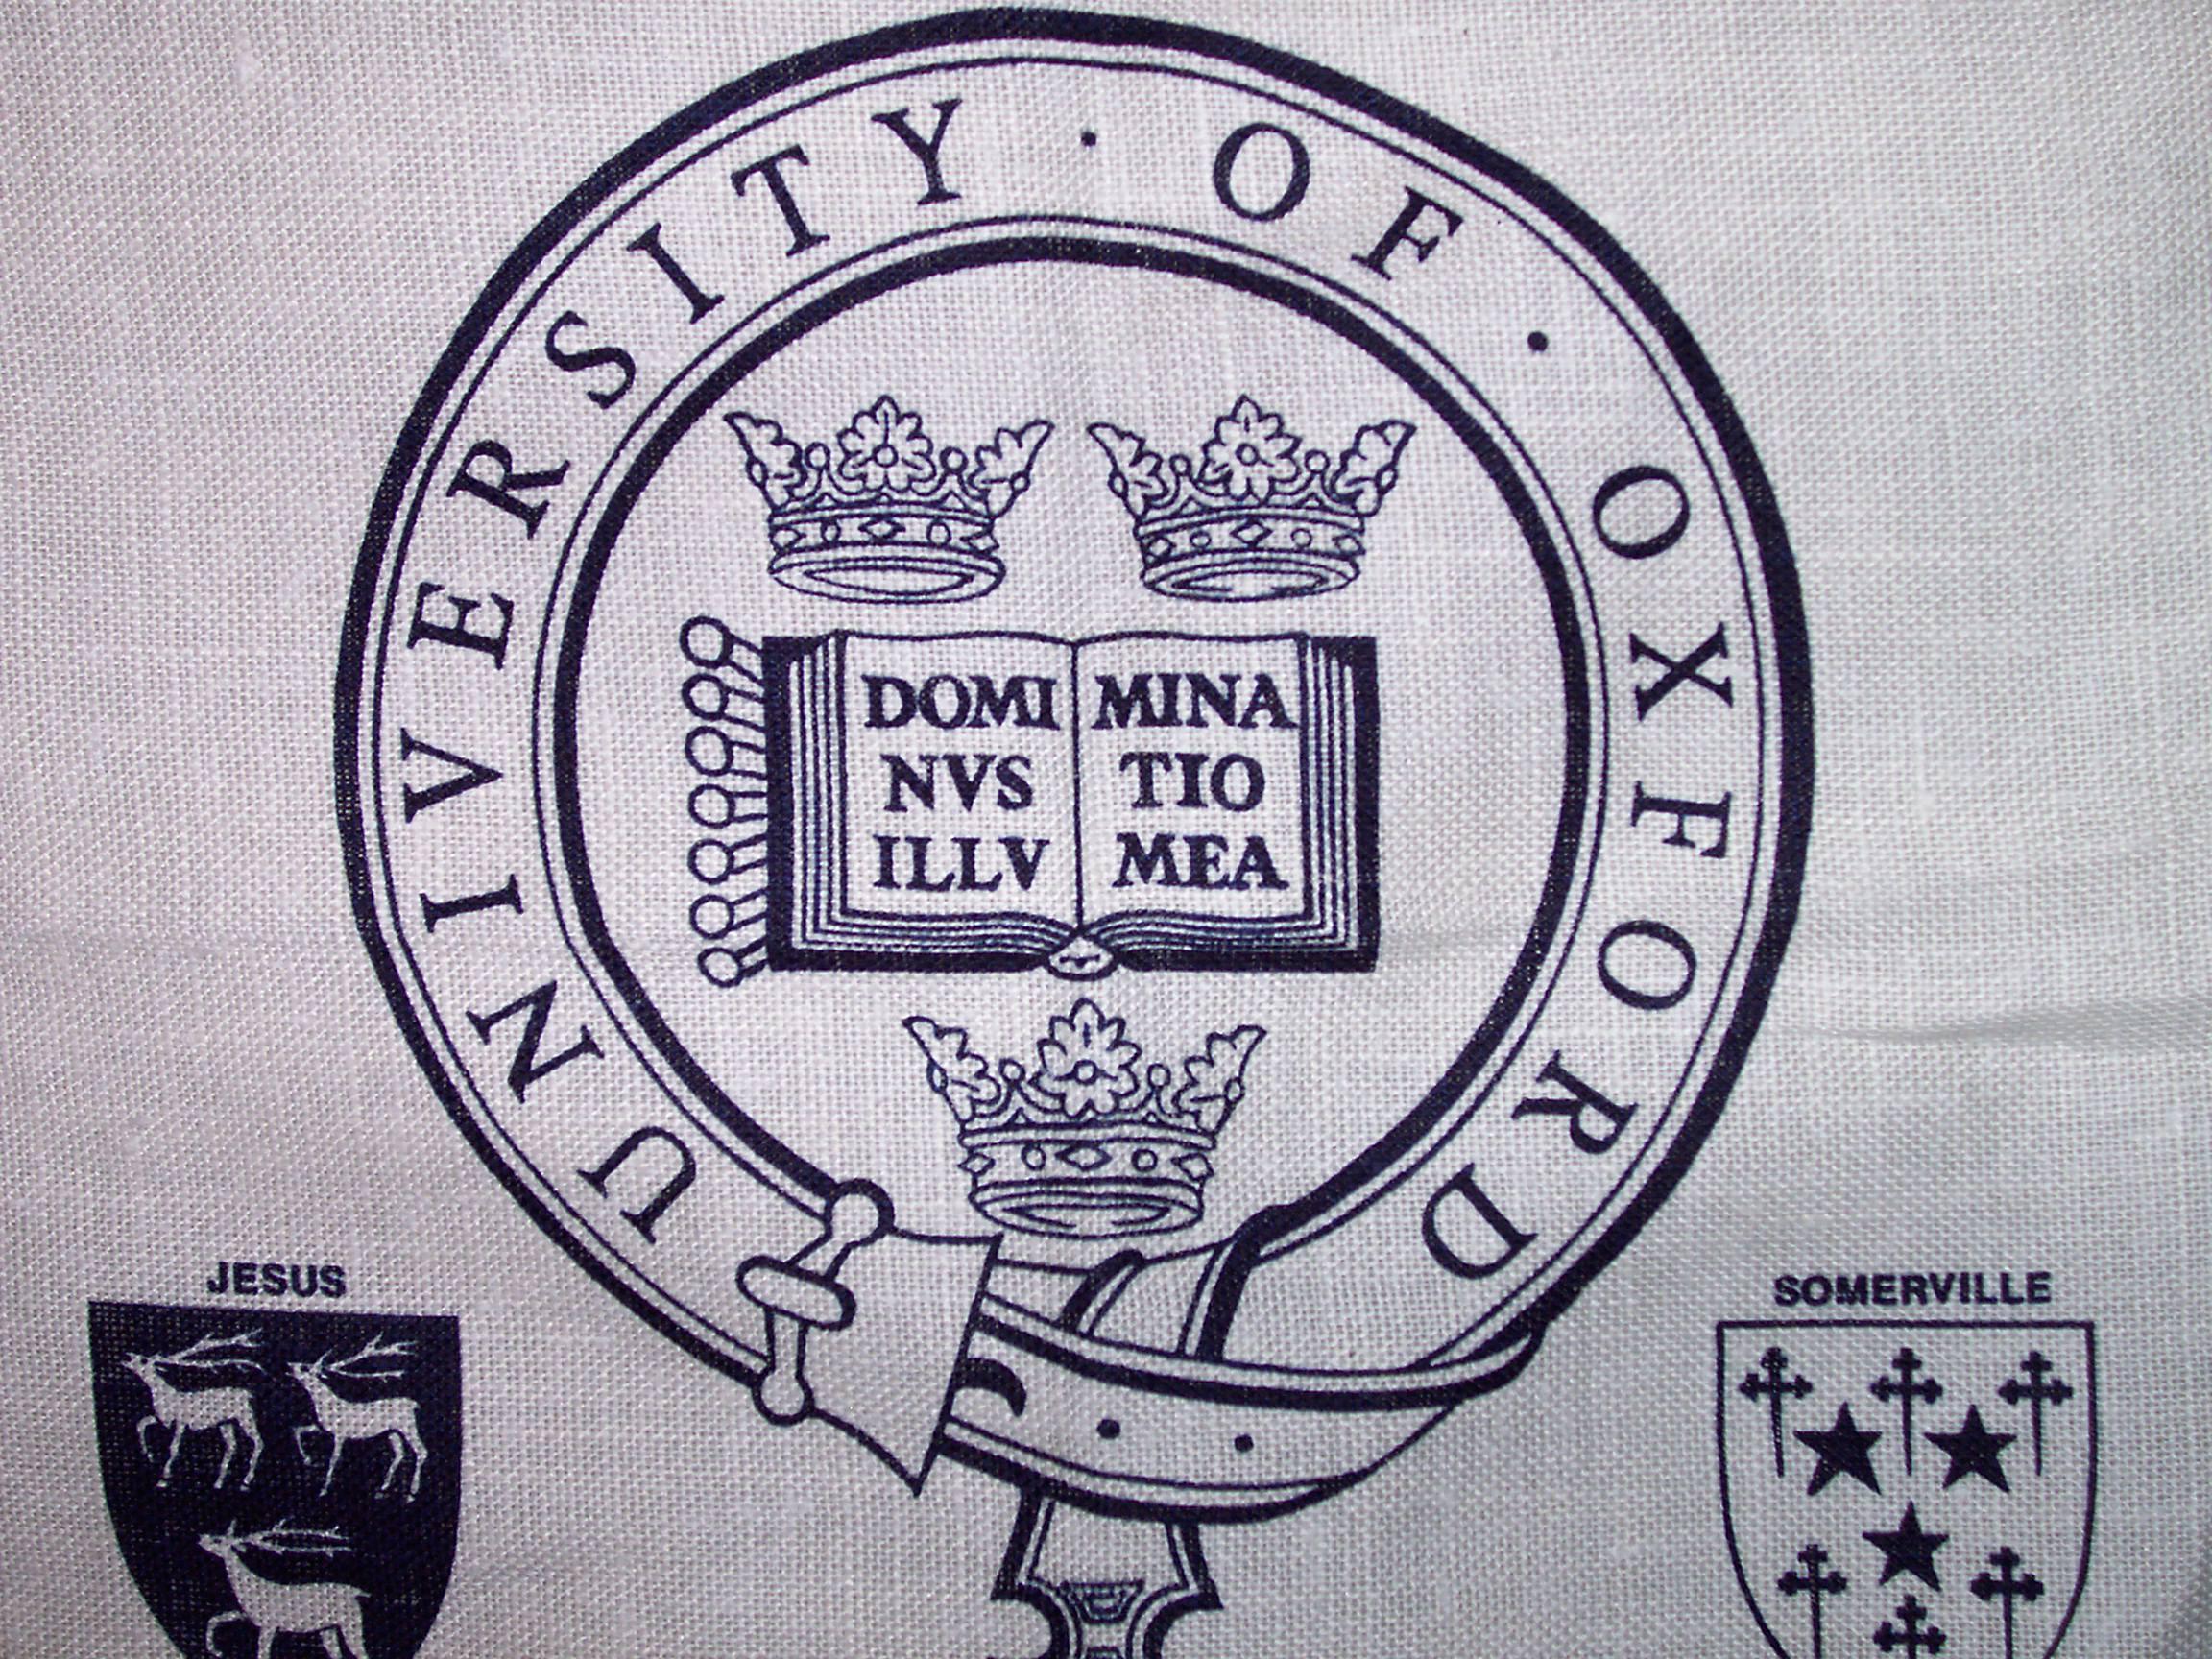 Calpernia to Speak at Oxford University February 27th, 2014